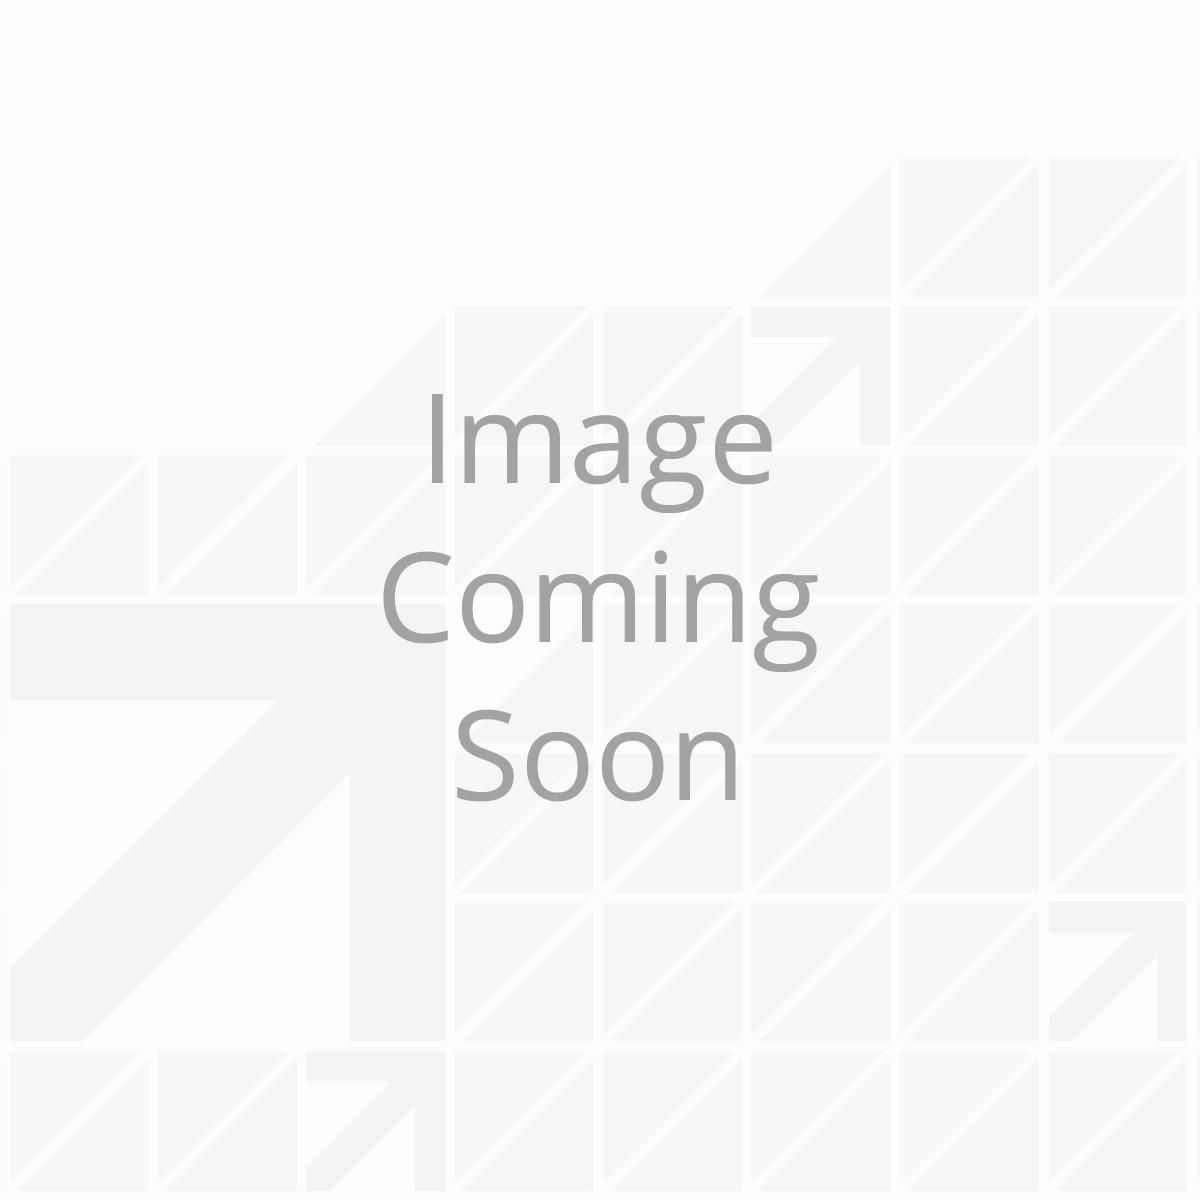 IMGL Step Motor and Screws, 14NM